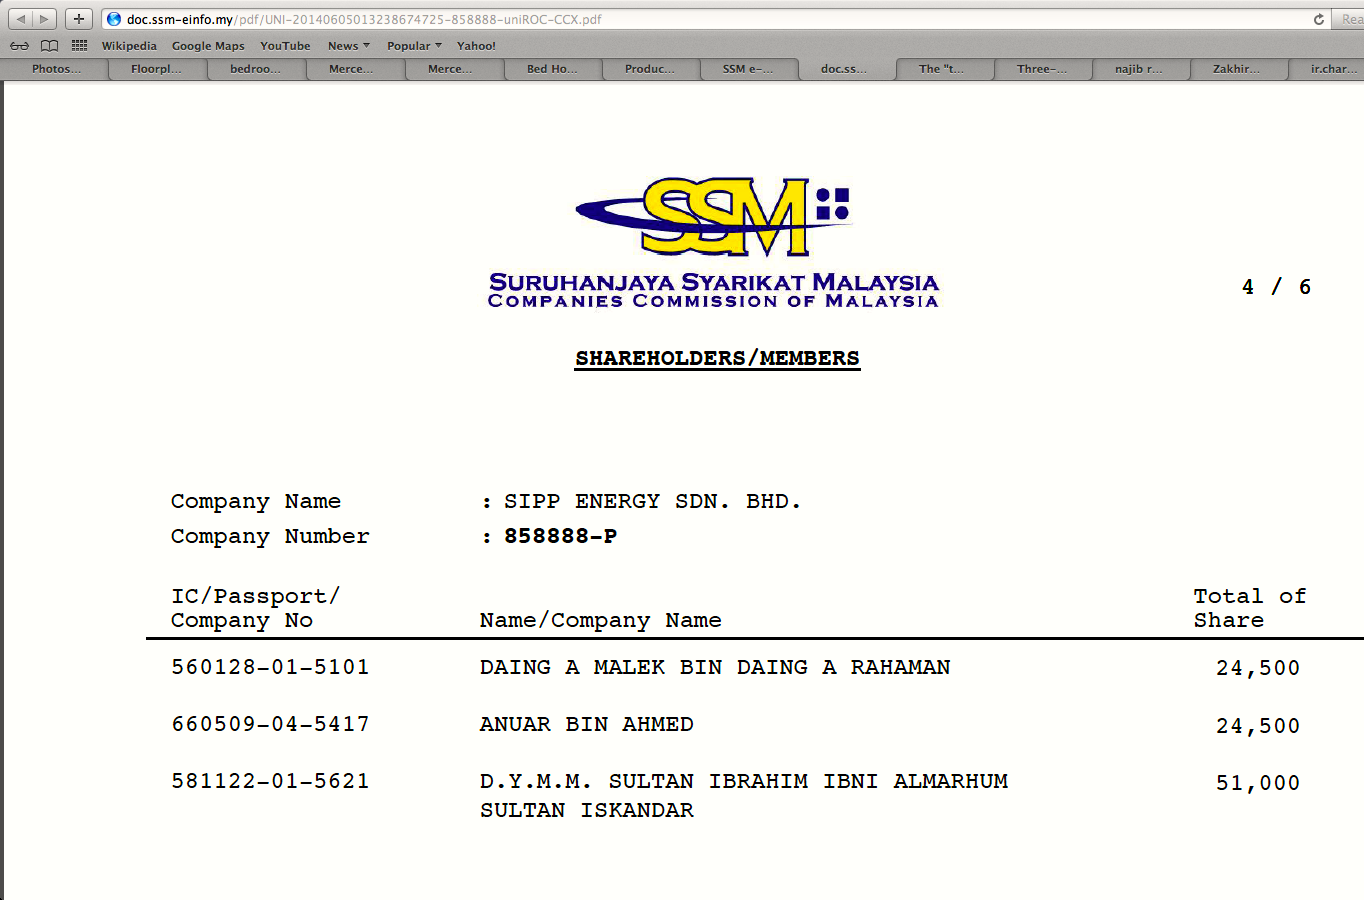 MELAYU PASIR GUDANG YTL TIDAK MENCEMAR INSTITUSI RAJA? ~ Backofen Sdn Bhd